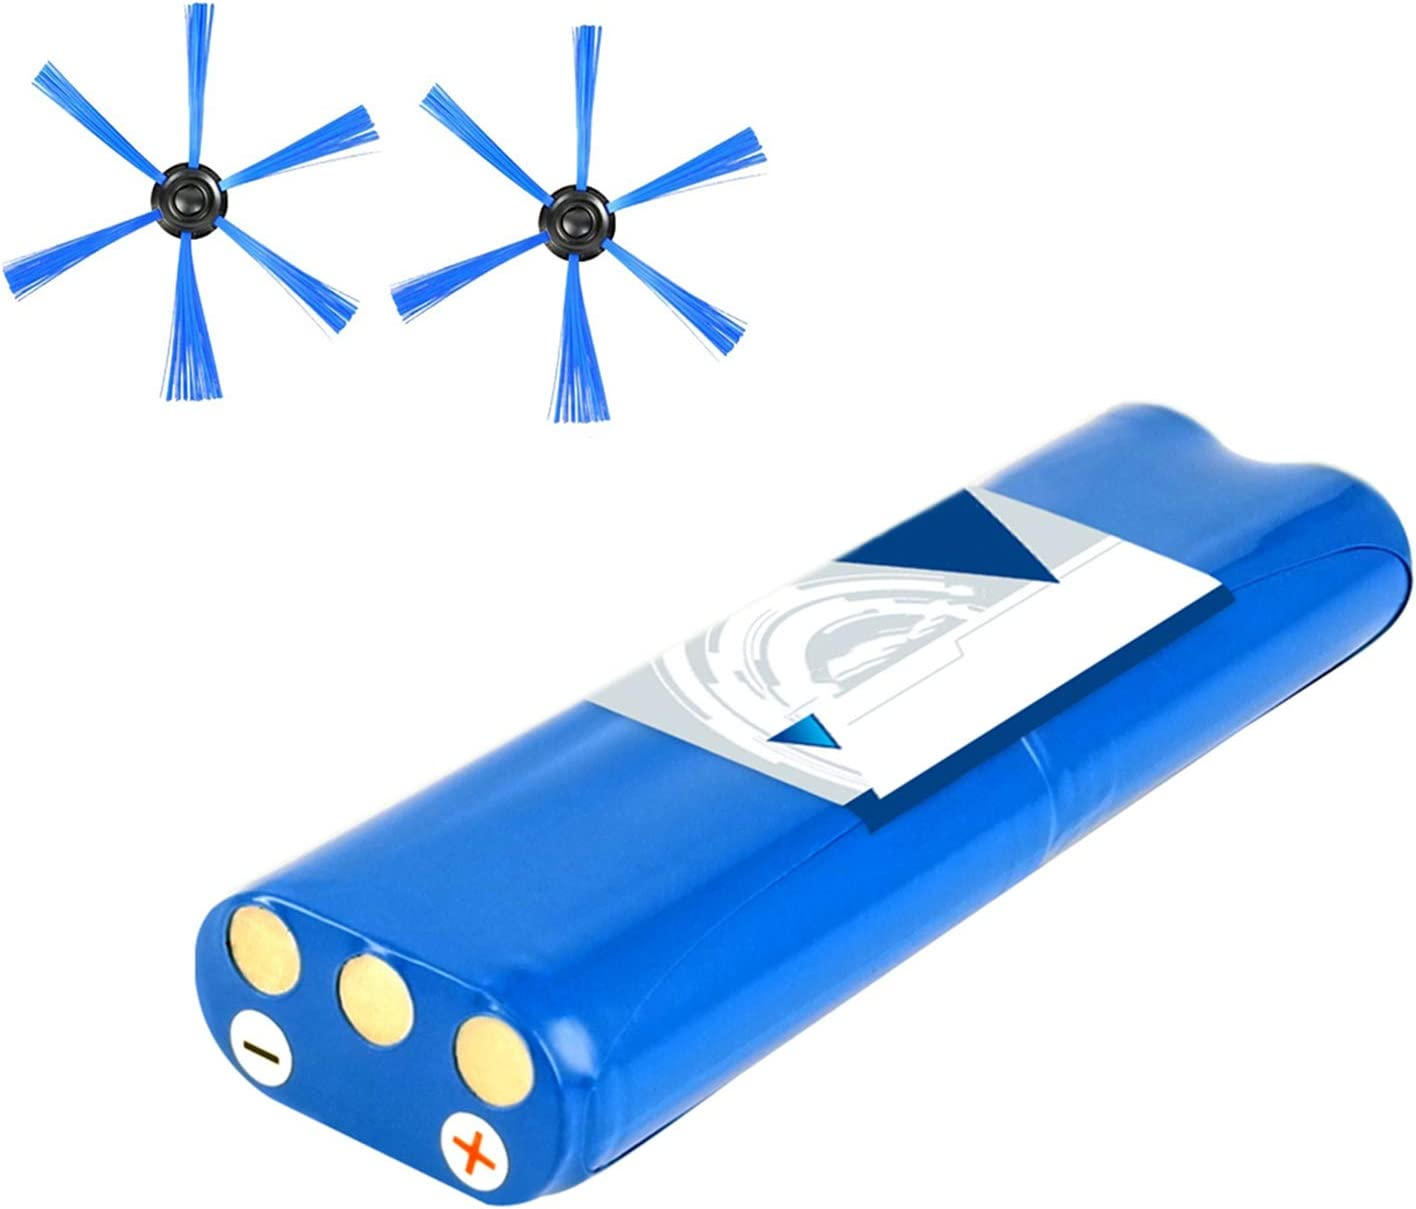 TOOGOO Cepillo Lateral de BateríA de Iones de Litio de 14.8V 2800Mah 18650 para Aspiradora Robotics Aspiradora Fc8820 Fc8810: Amazon.es: Hogar